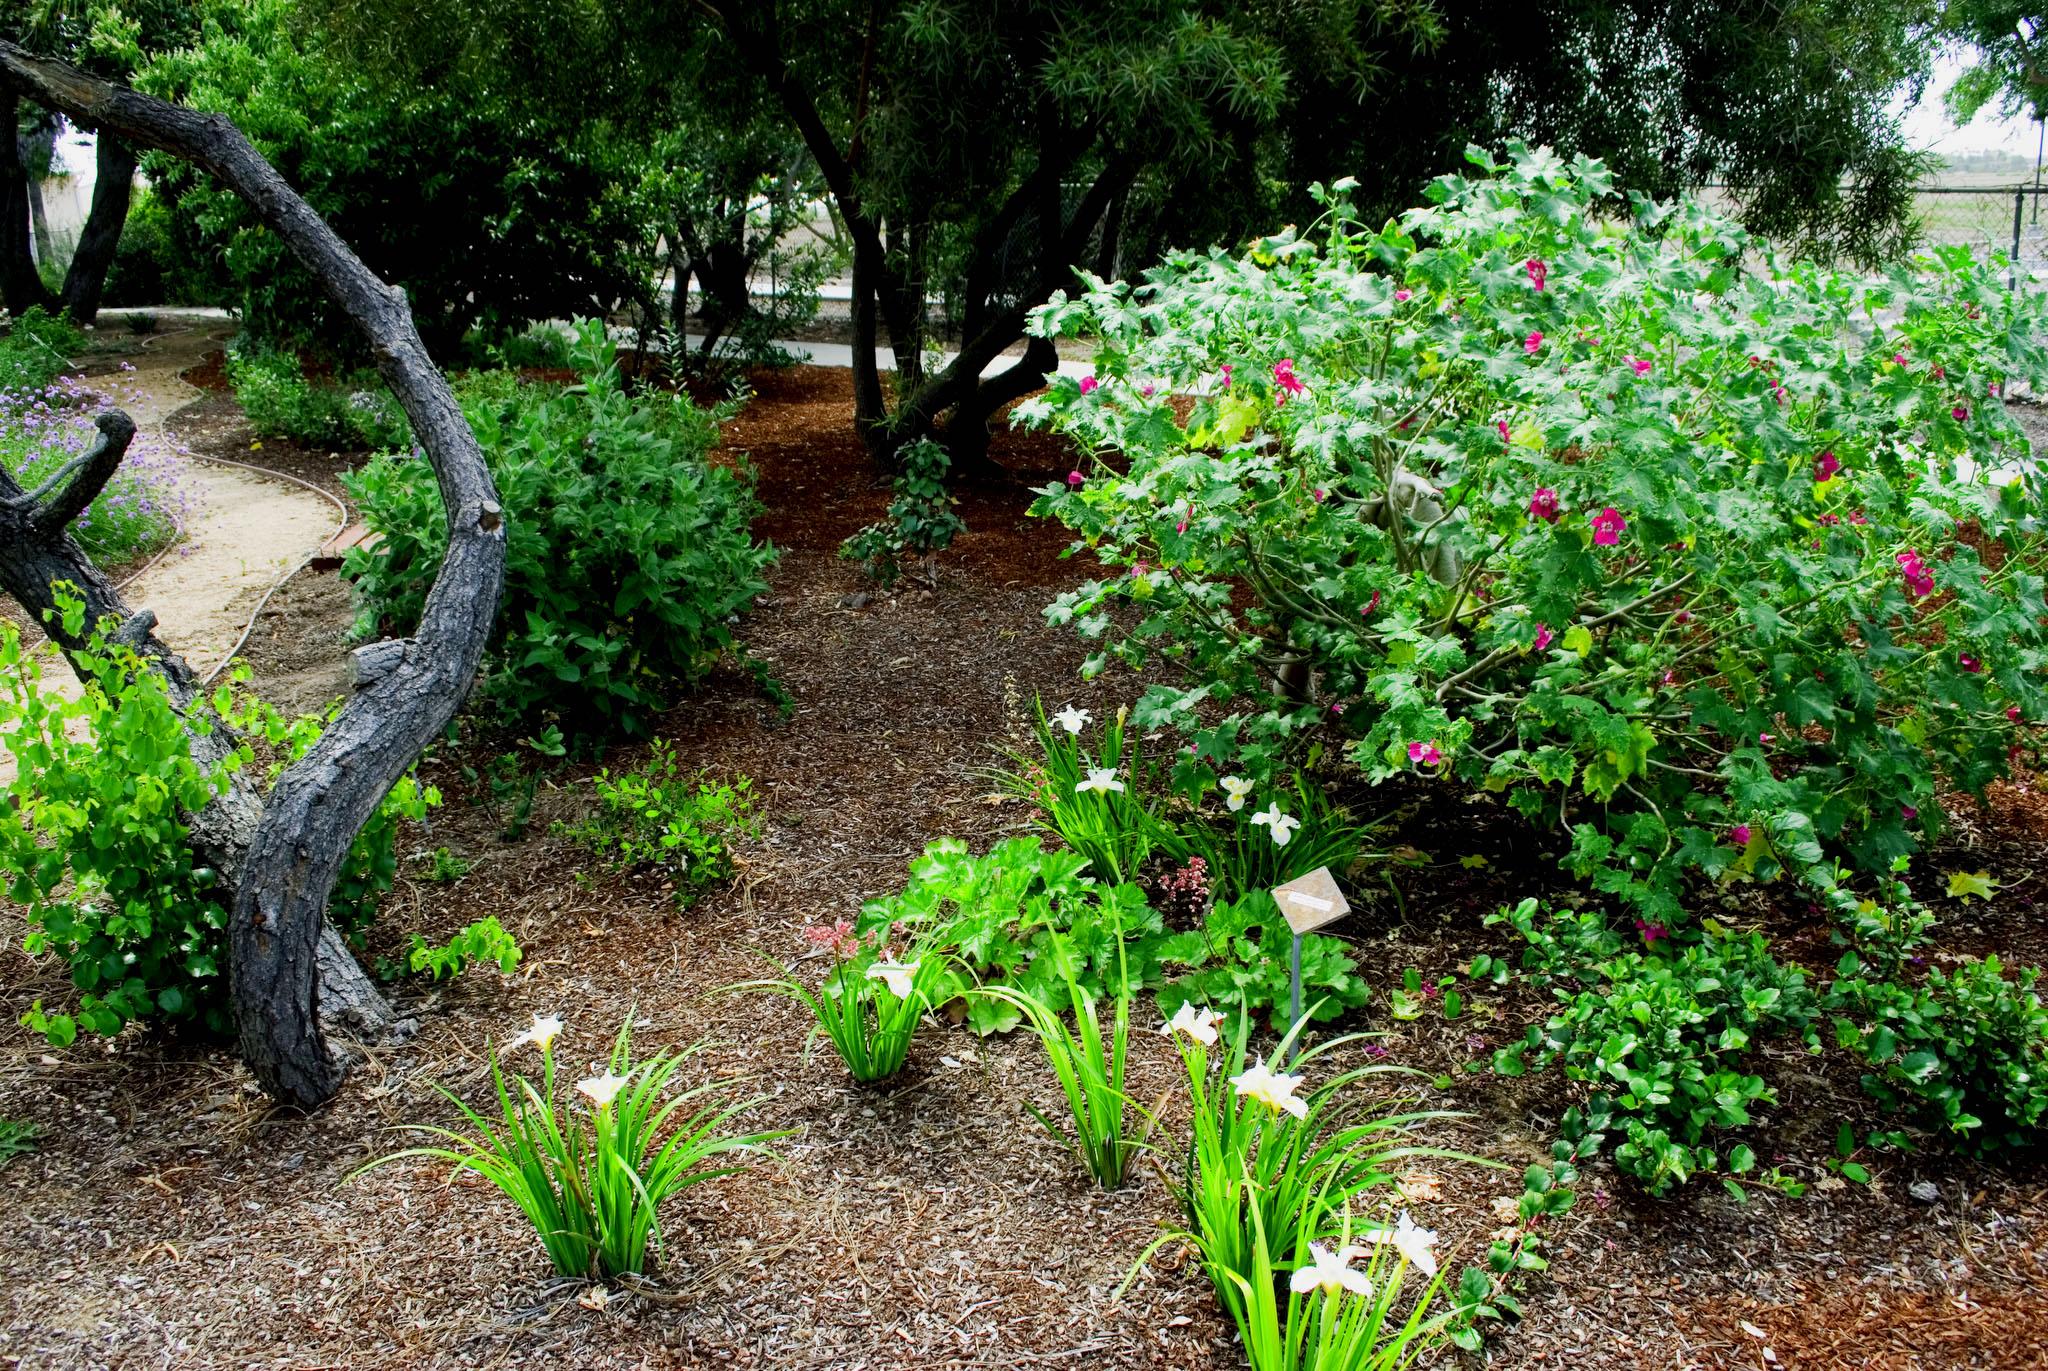 Tree Mallow (Lavatera assurgentiflora) PC Barbara Hebel.jpeg